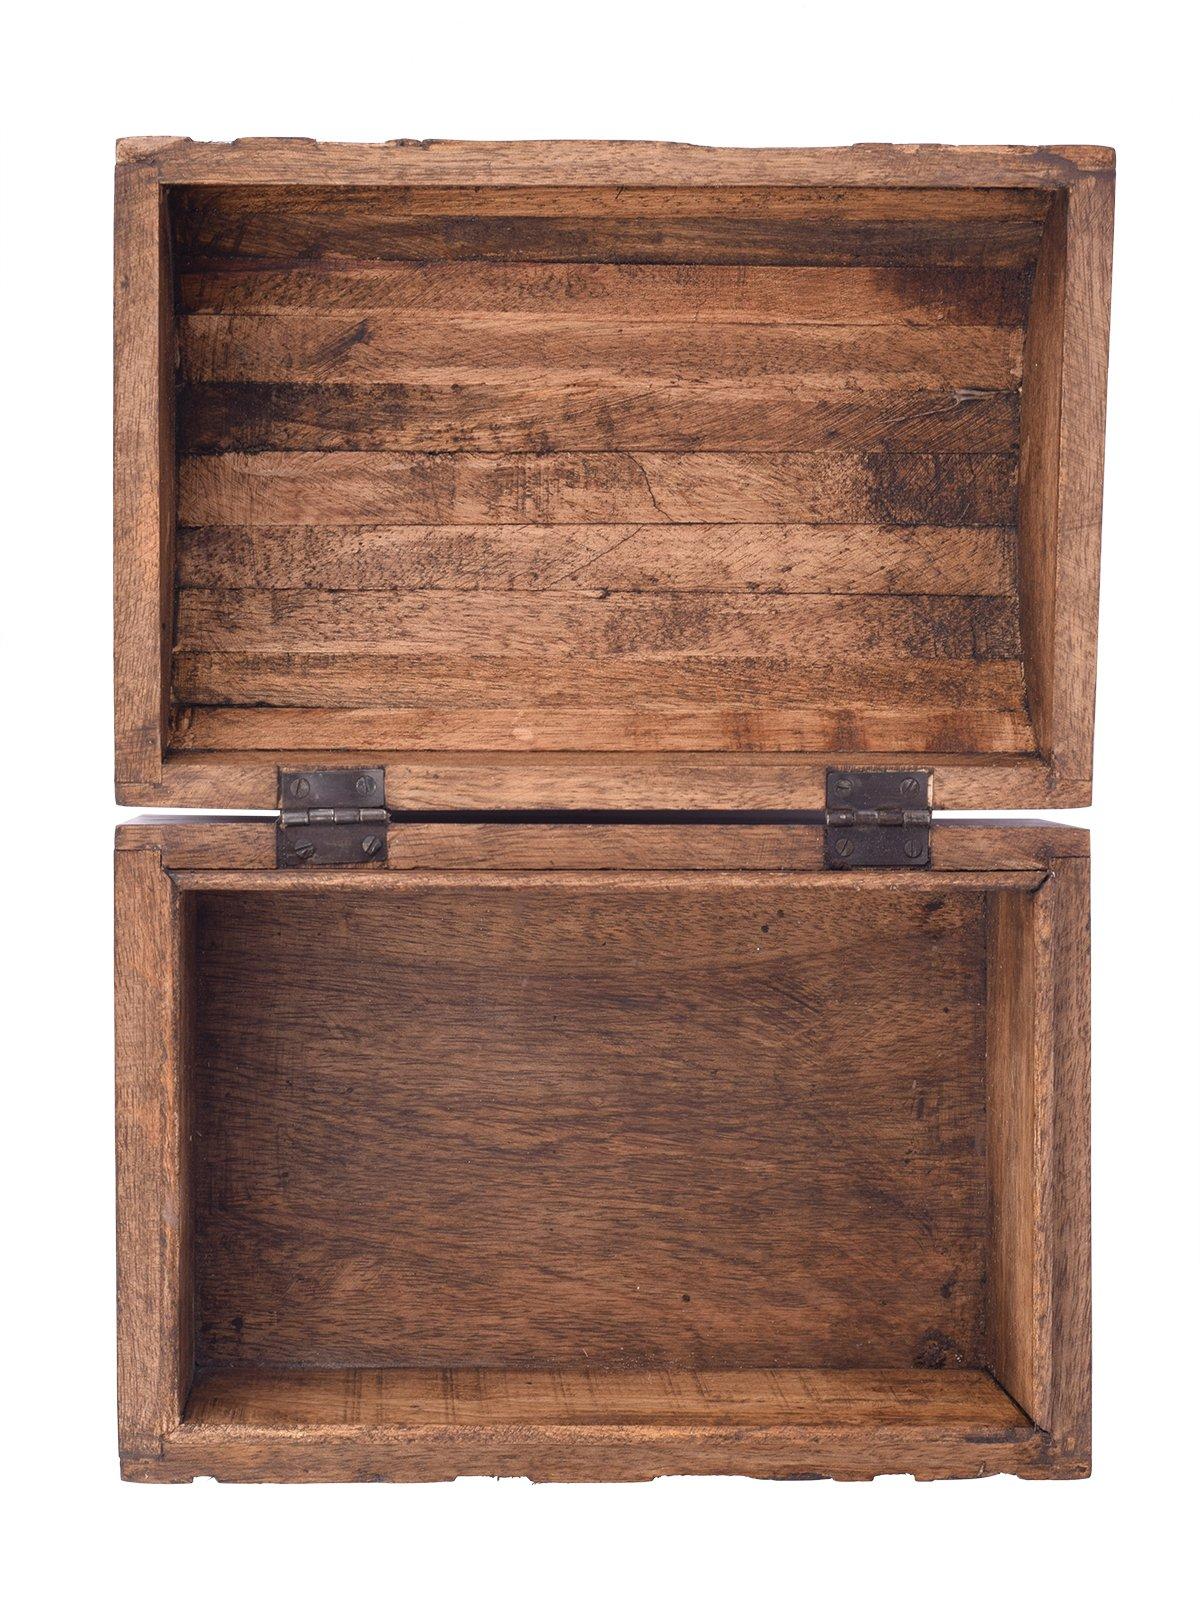 Large Wooden ''Tree of Life'' Chest Box Decorative Jewelry Trinket Holder Keepsake Storage Box Organizer Multi-utility 9 x 6 inches by storeindya (Image #4)